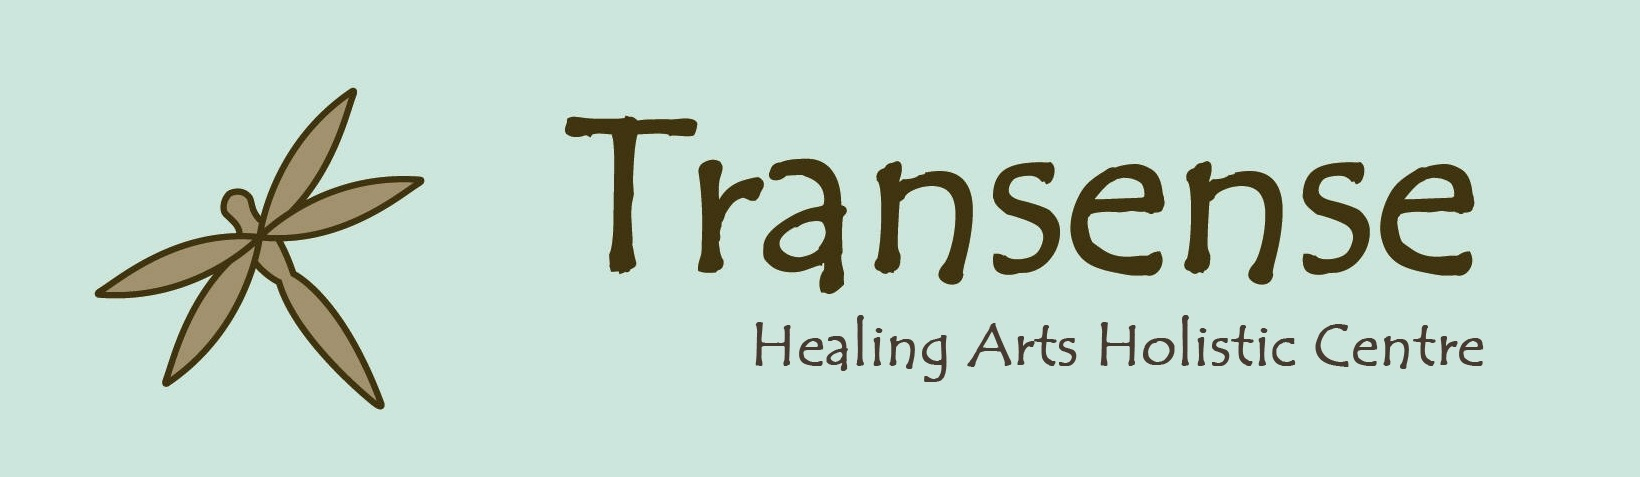 Transense